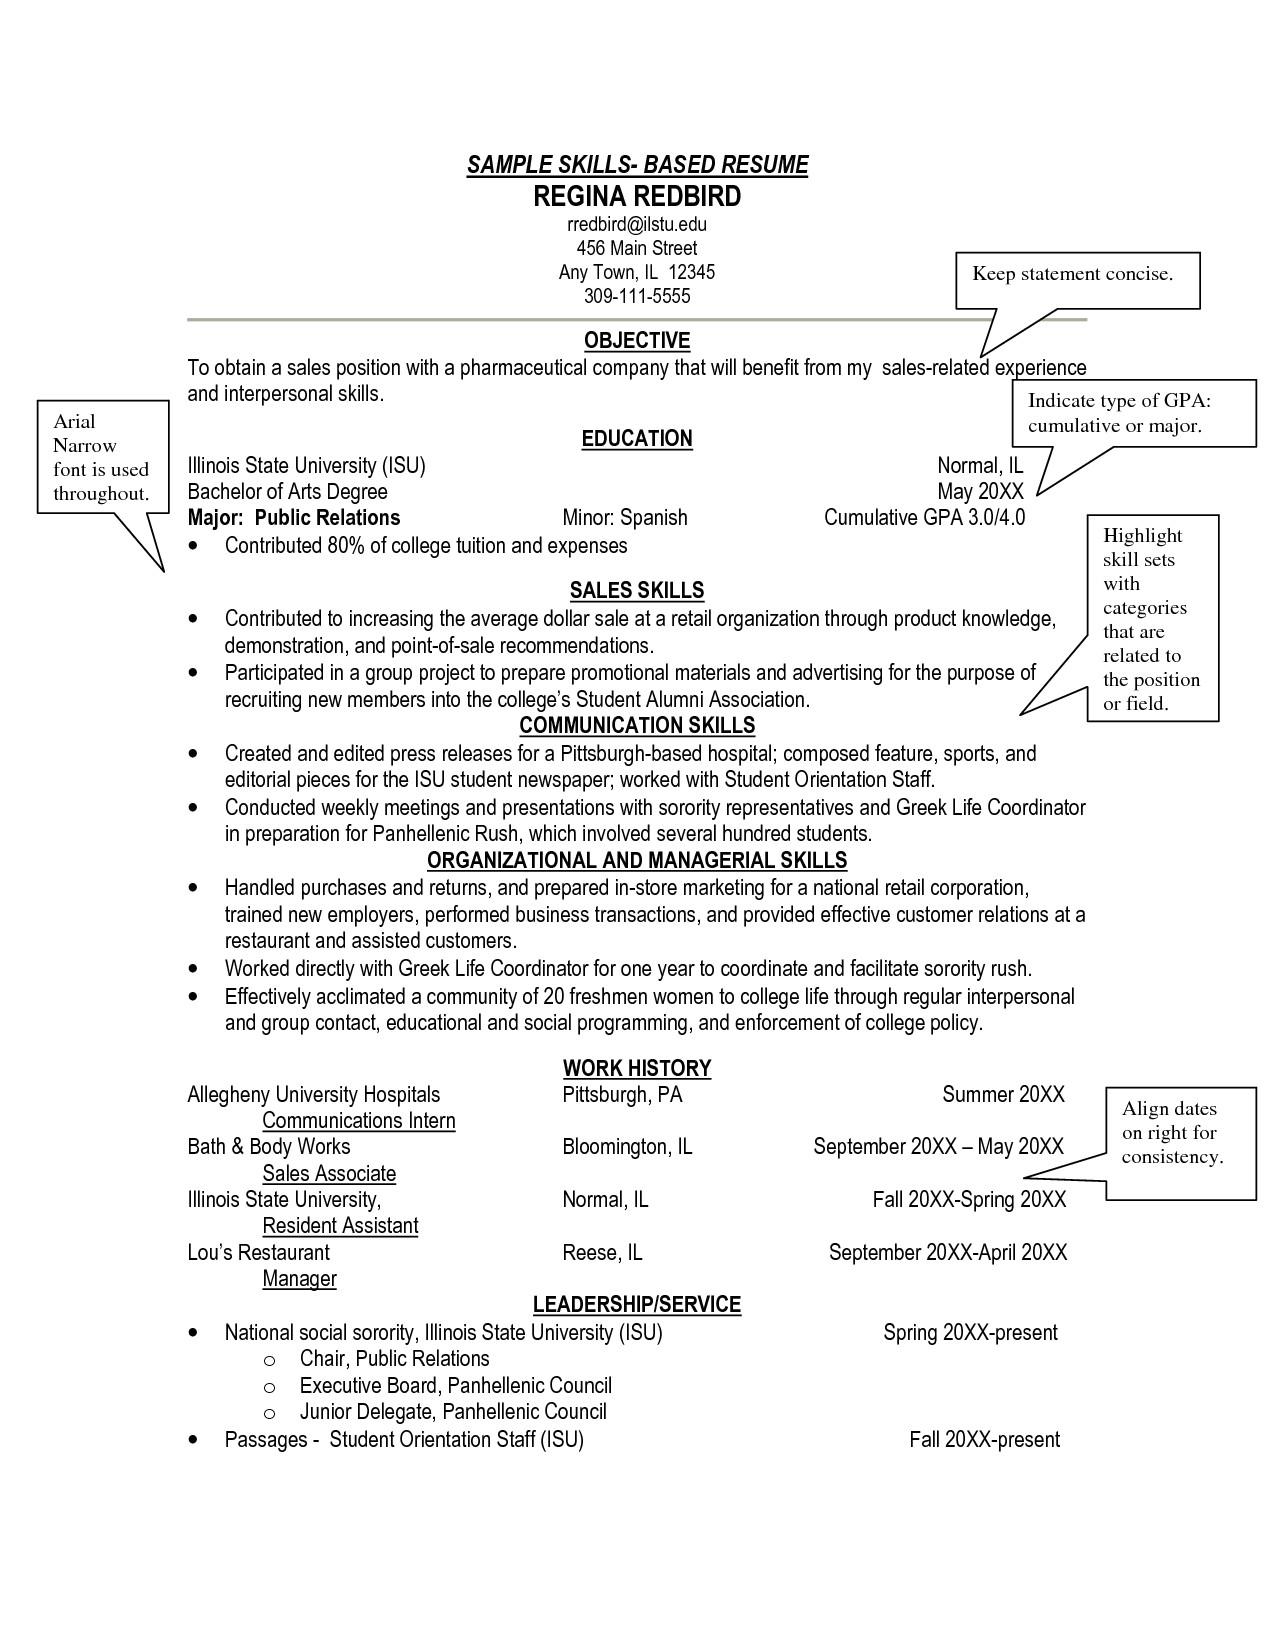 job skills resume